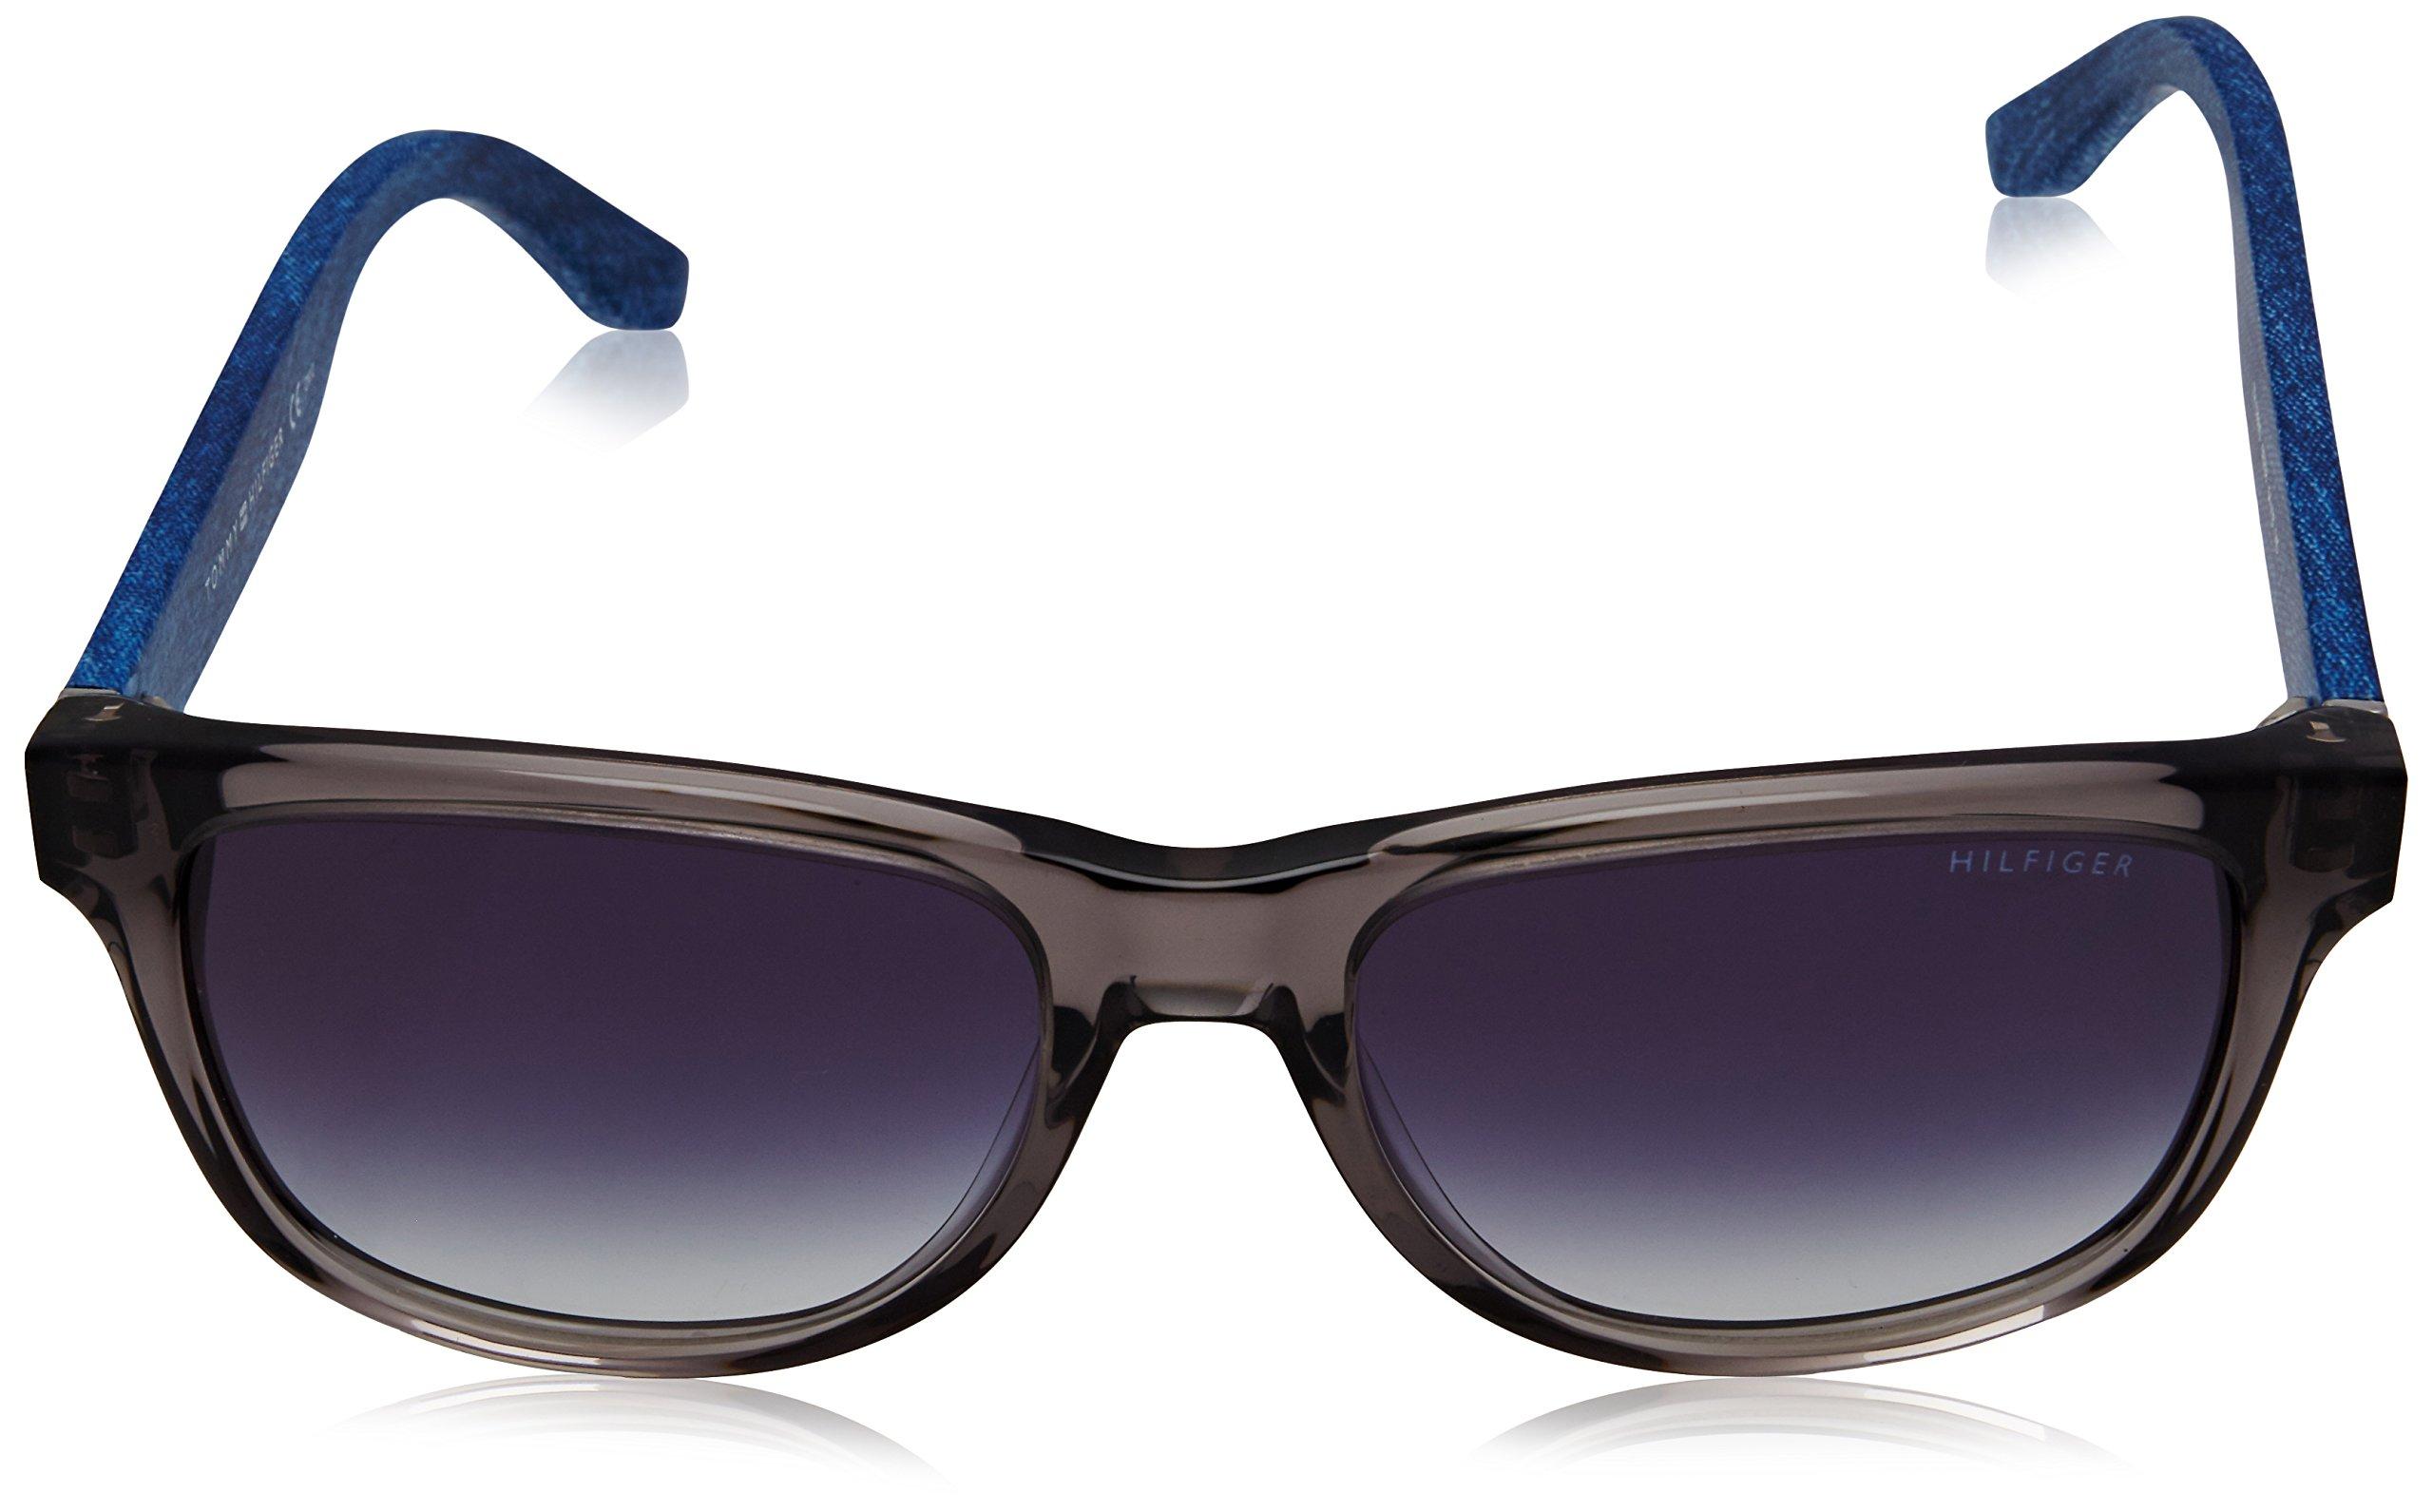 Tommy Hilfiger TH 1266/S 08 5EZ 54 Gafas de sol, Gris (Grey Blu Jeans/Grey Blu), Unisex Adulto